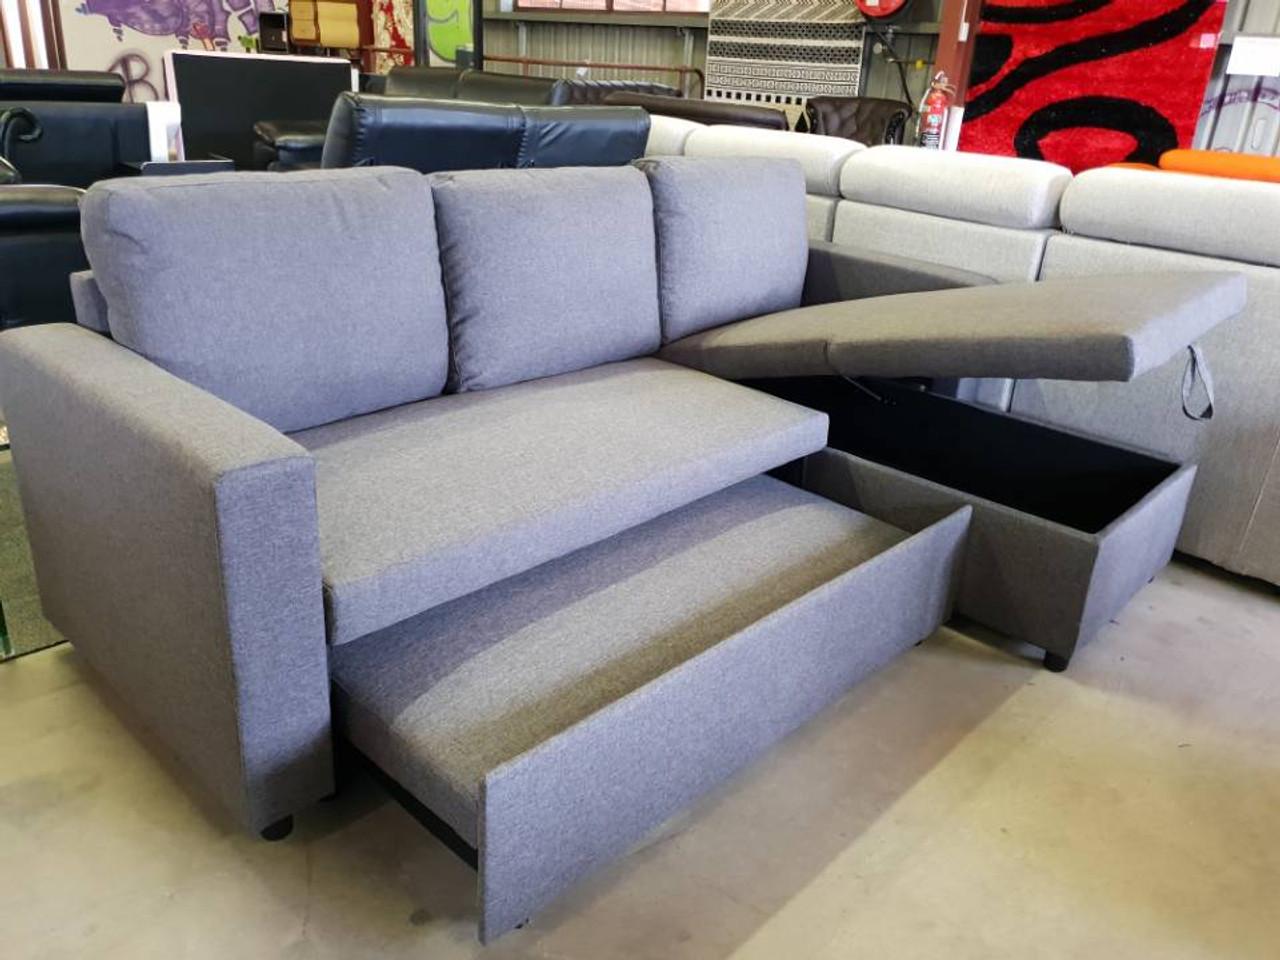 fabric gas lift storage sofa bed e cheap a furniture sydney rh afurniture com au